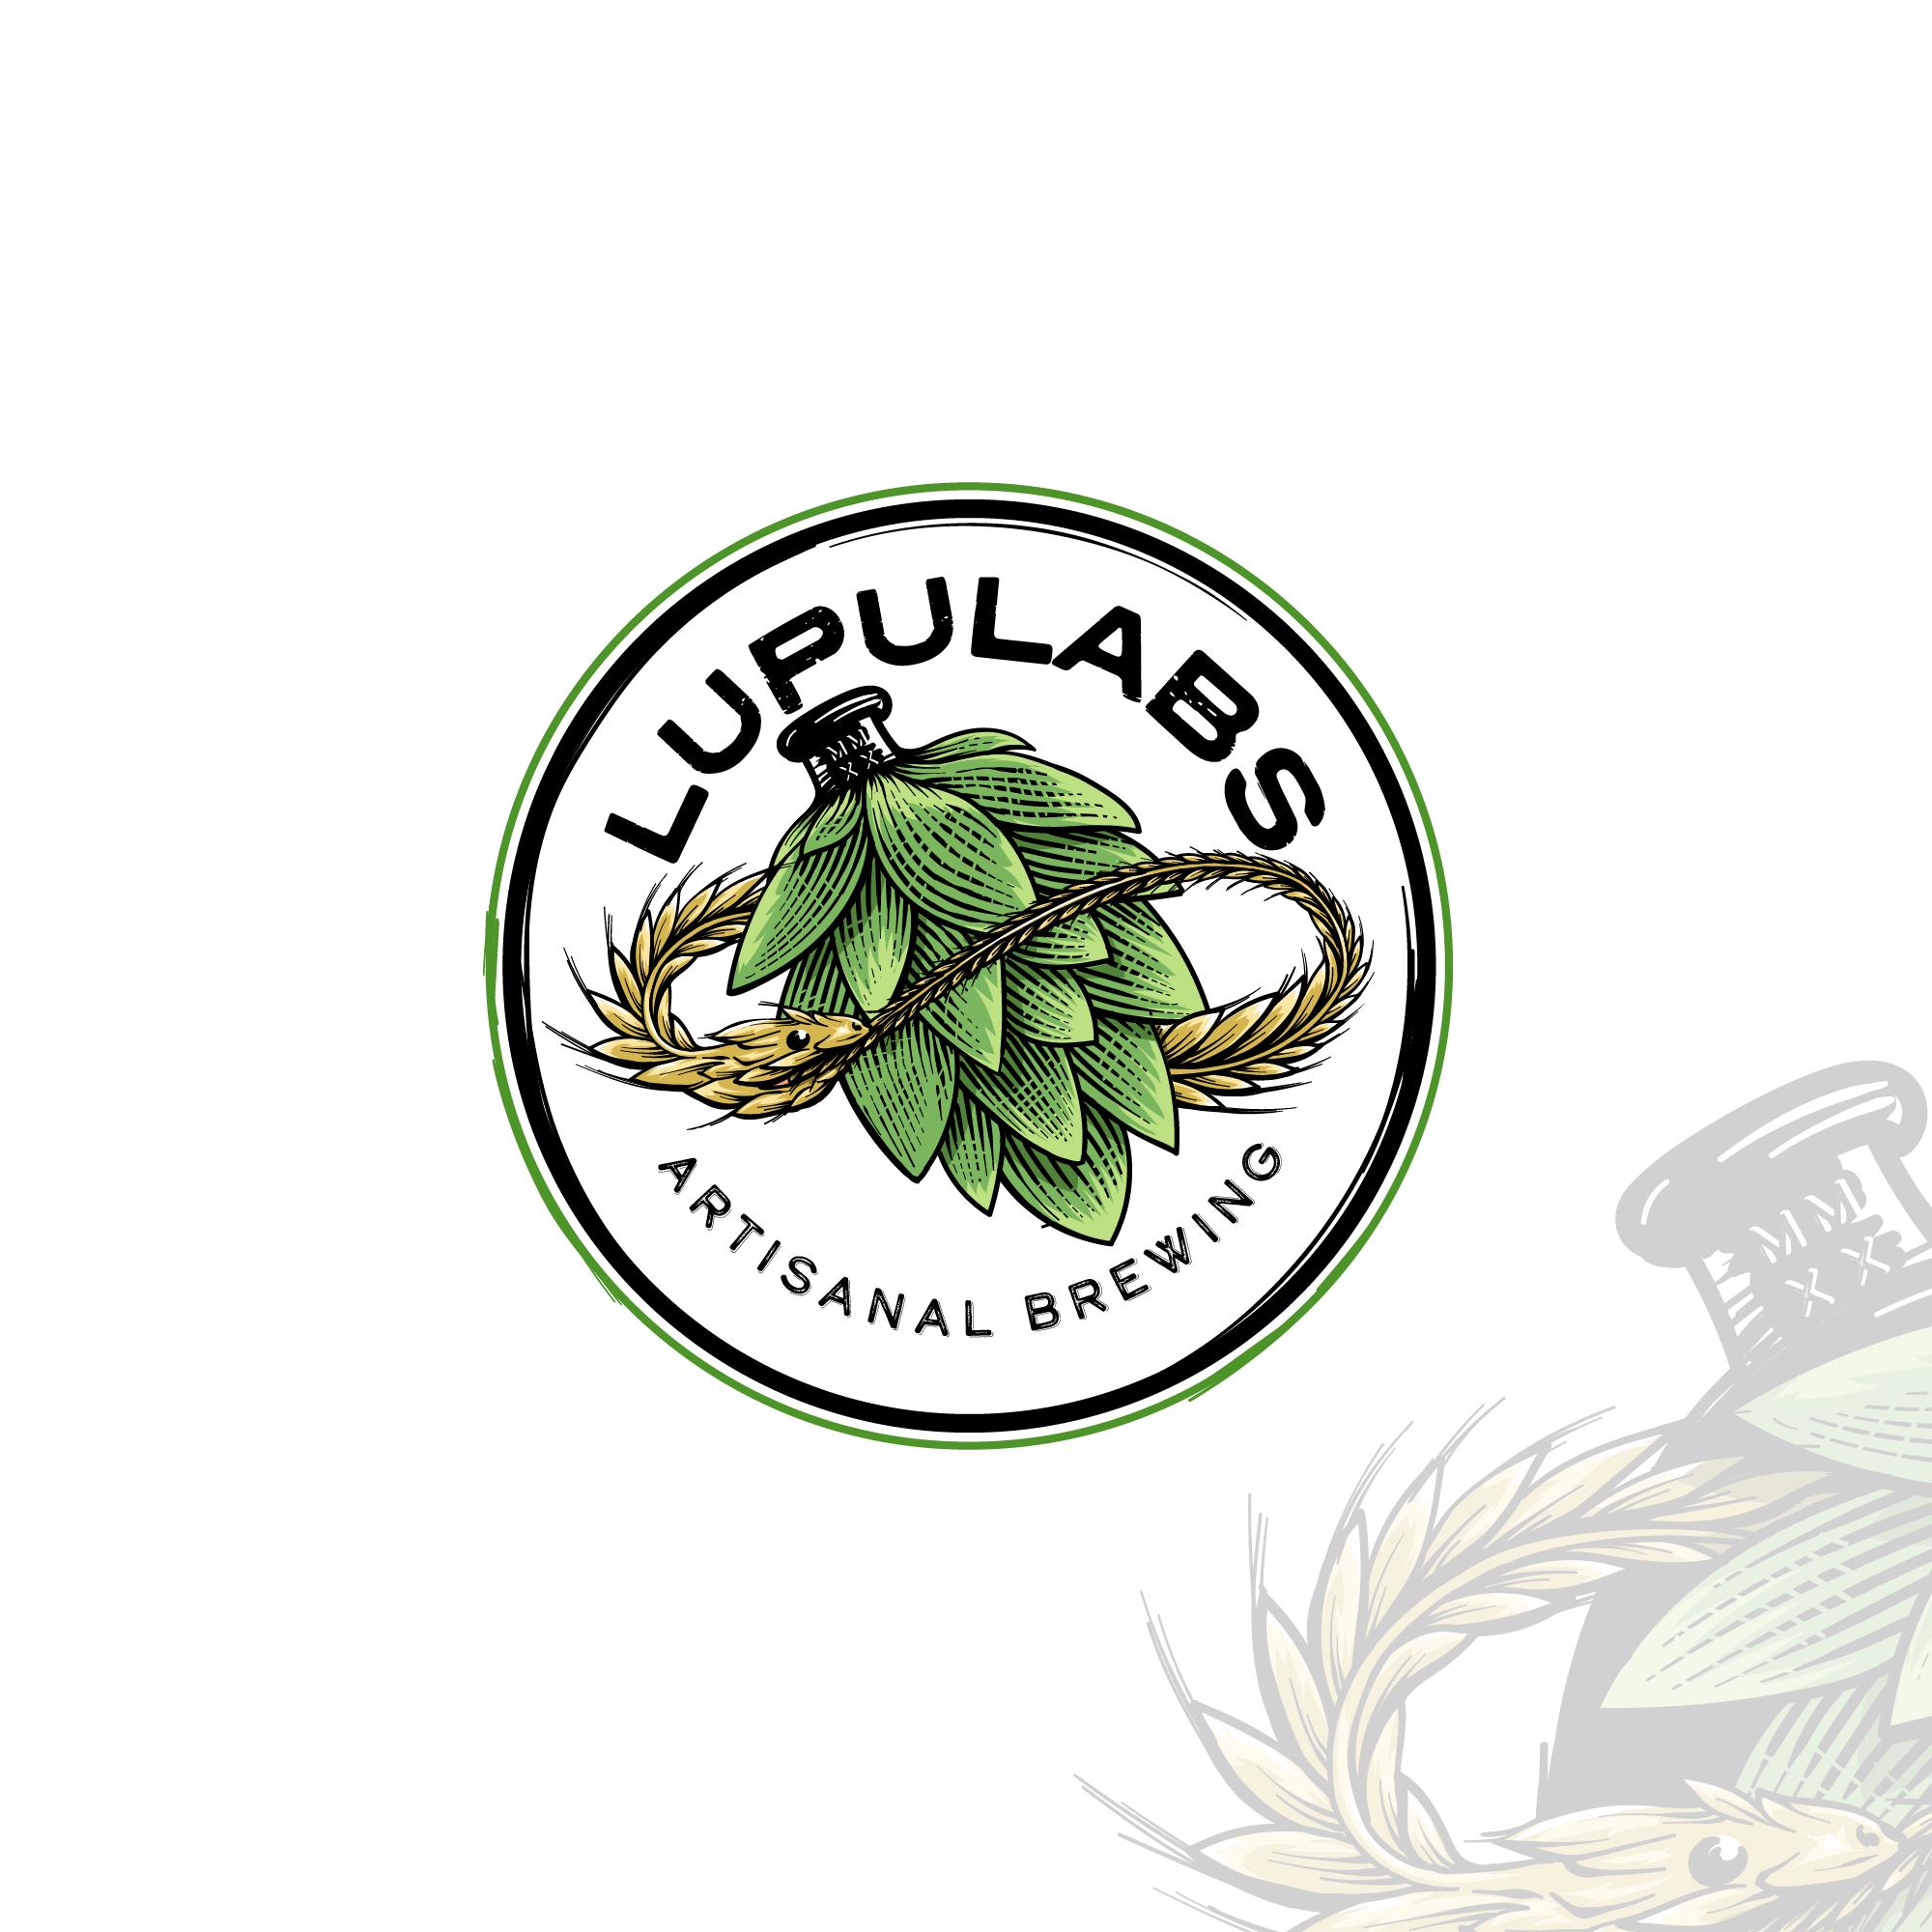 International Craft Brewery LUPULABS logo design